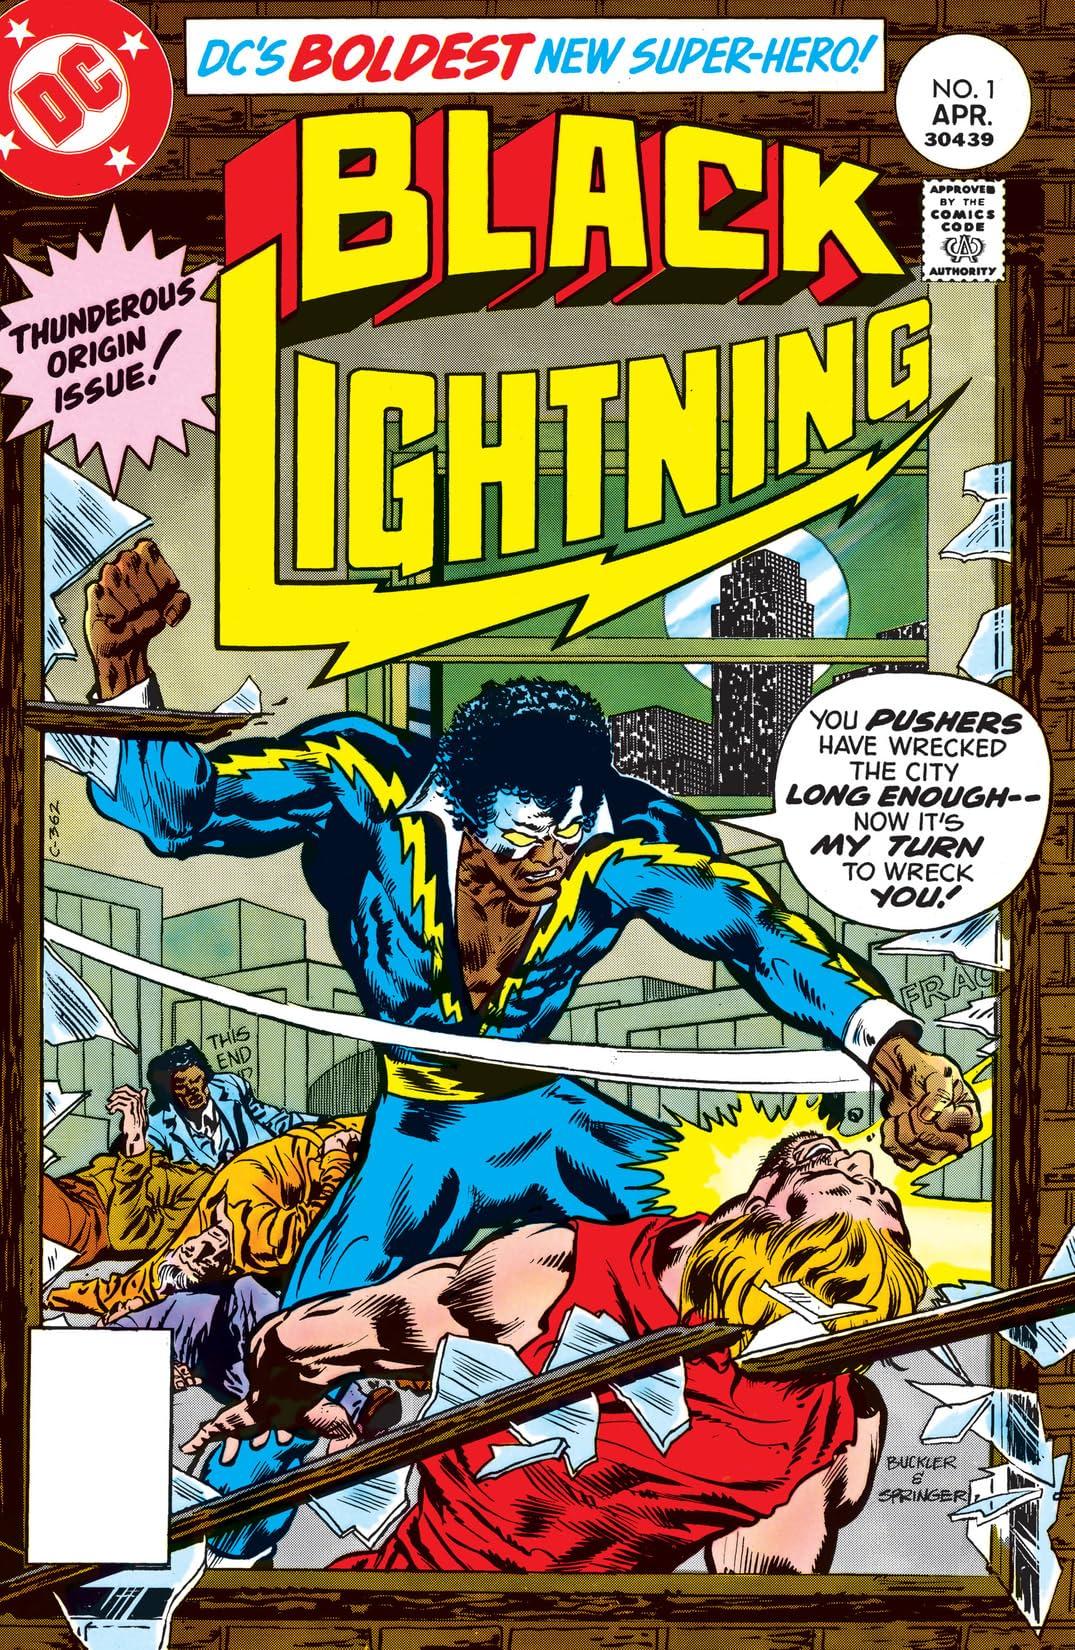 Black Lightning (1977-1978) #1 - Comics by comiXology